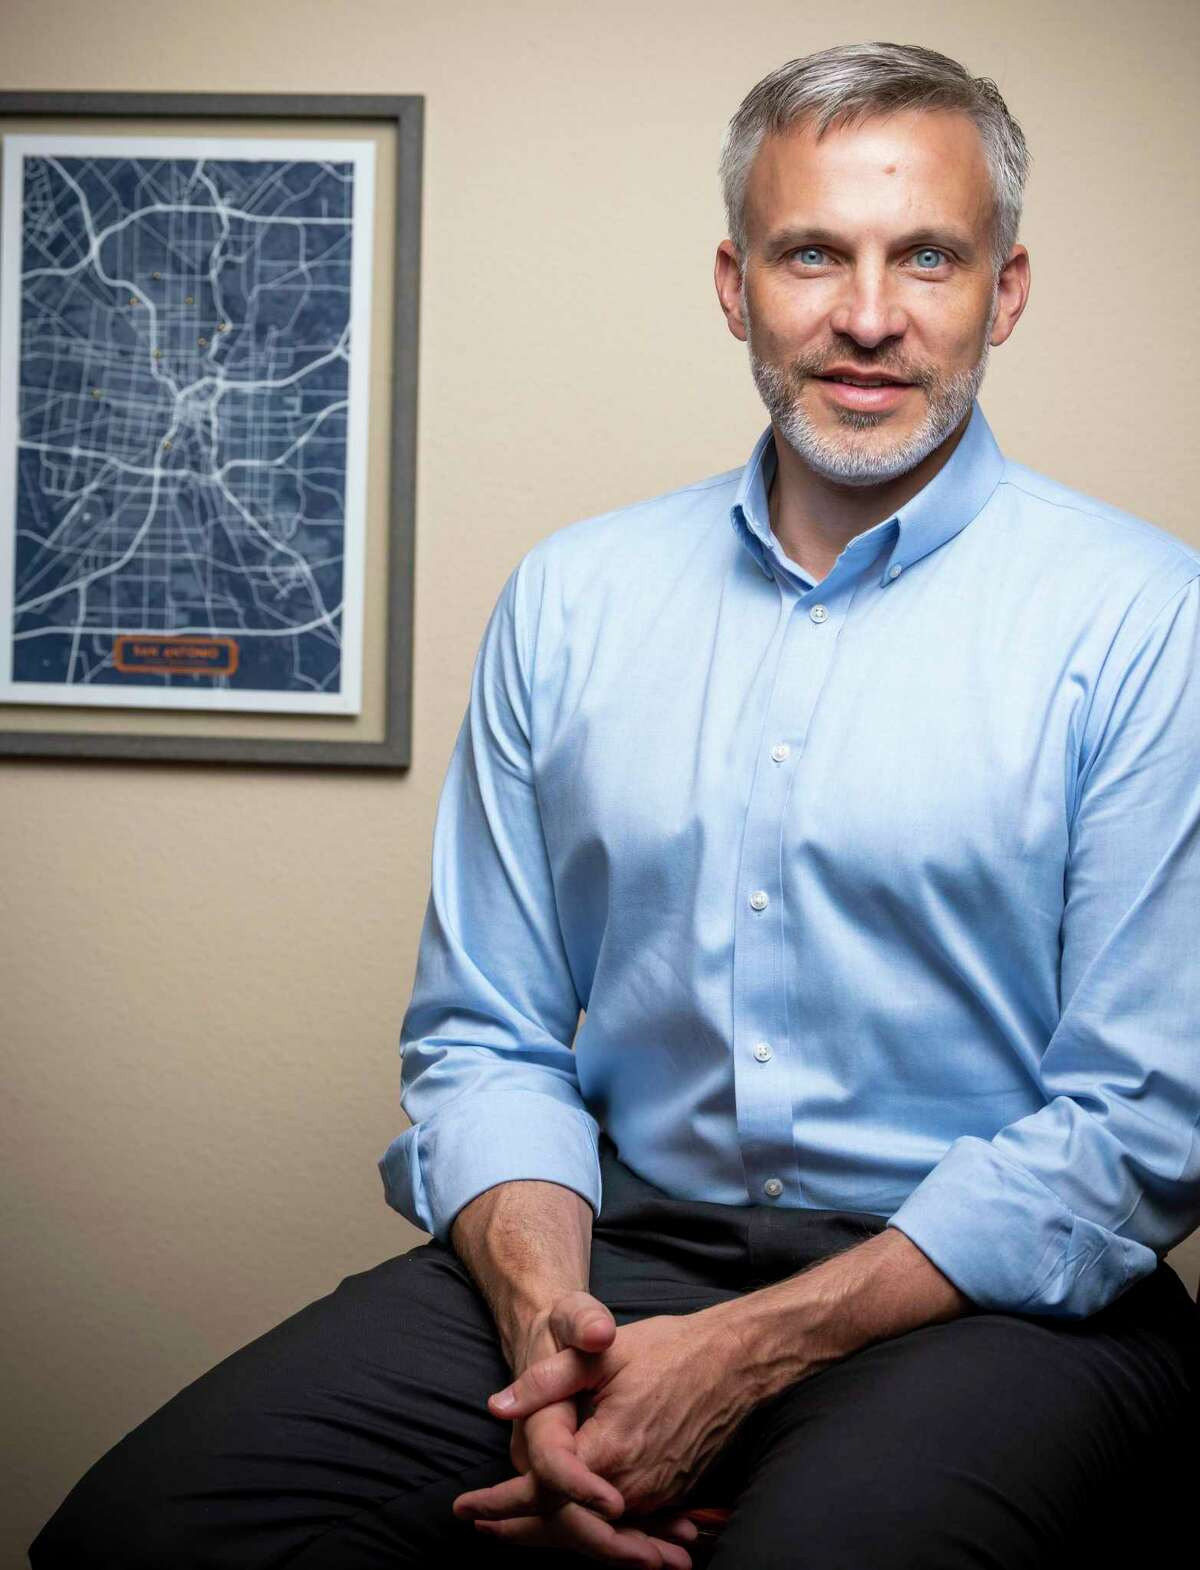 Mark Larson, former head of KIPP San Antonio is the current head of City Education Partners.